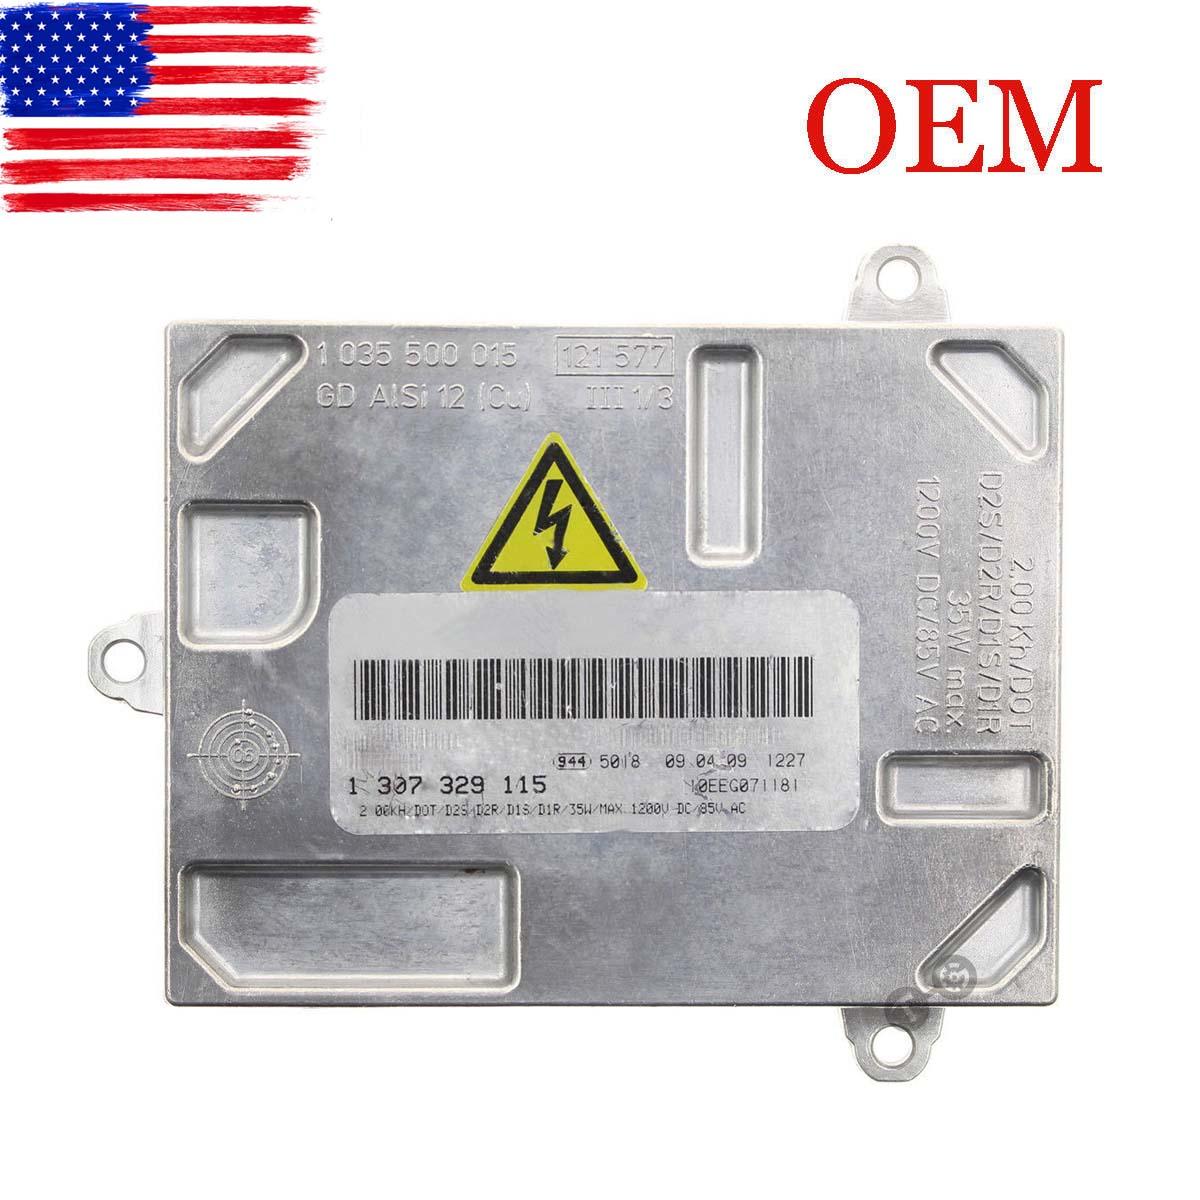 OEM AL HID Xenon Ballast Control Unit Module For 06-11 Cadillac DTS 1307329115